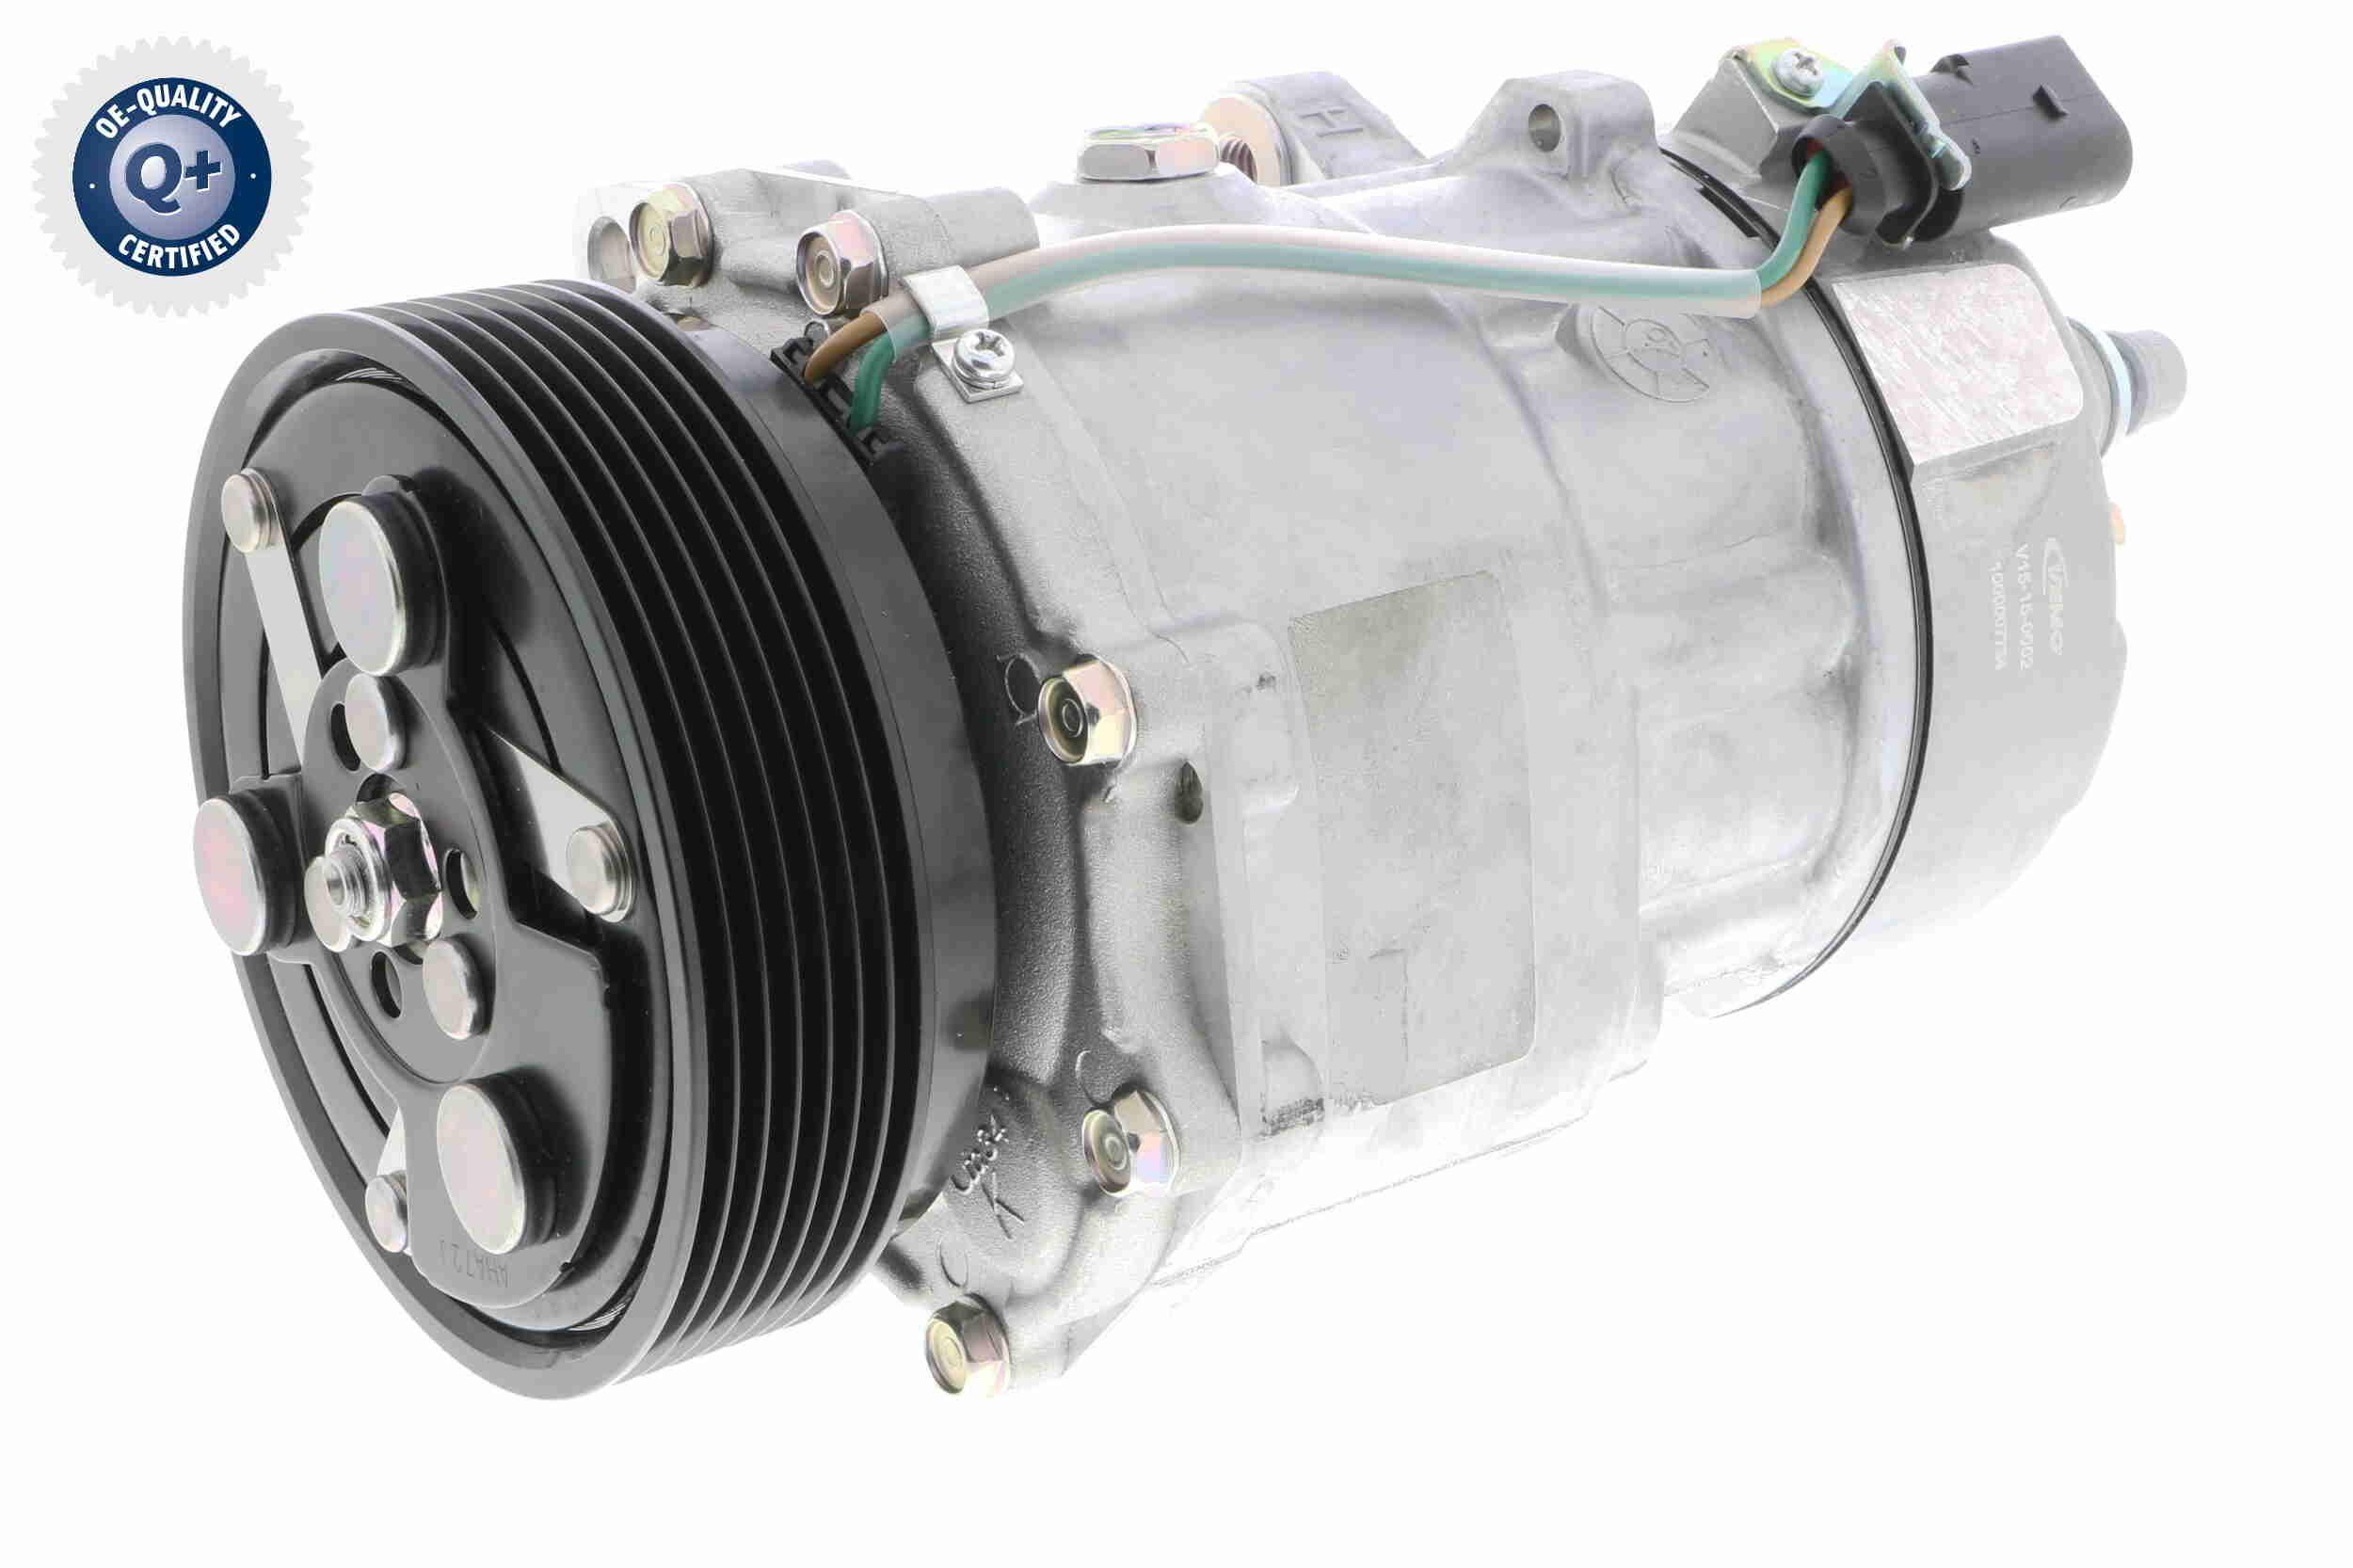 Original SEAT Kompressor V15-15-0002